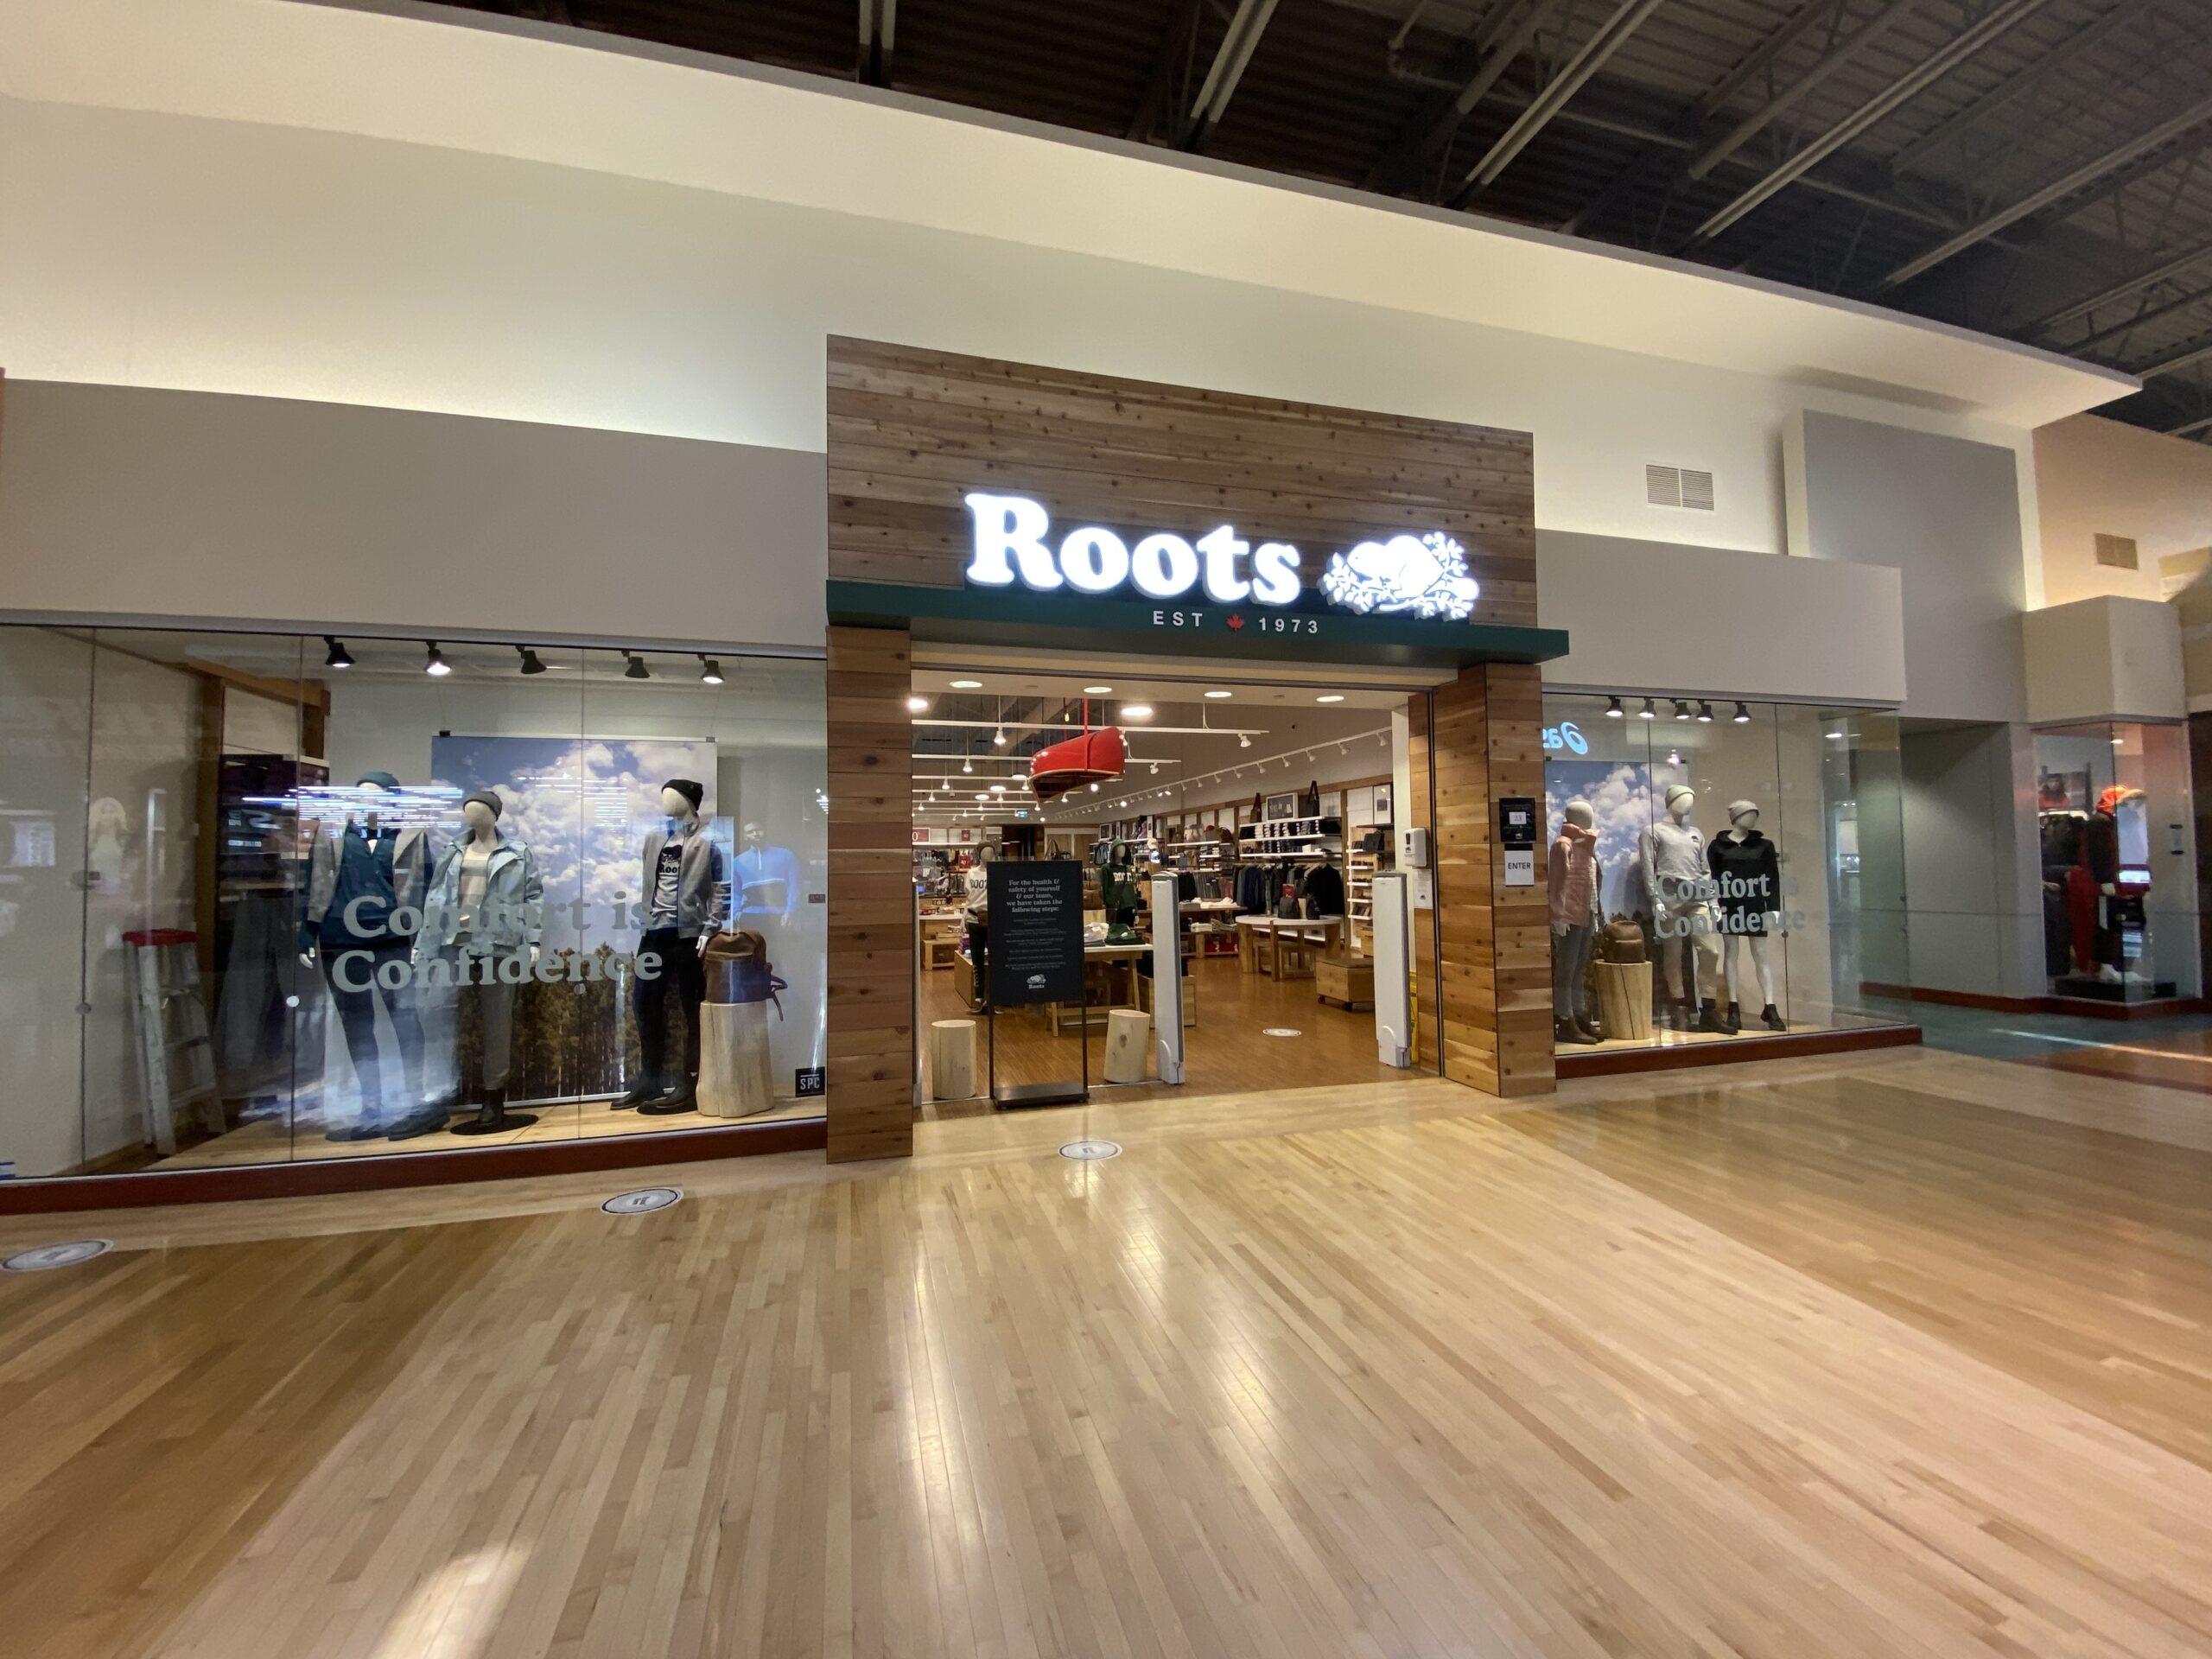 Roots at CrossIron Mills